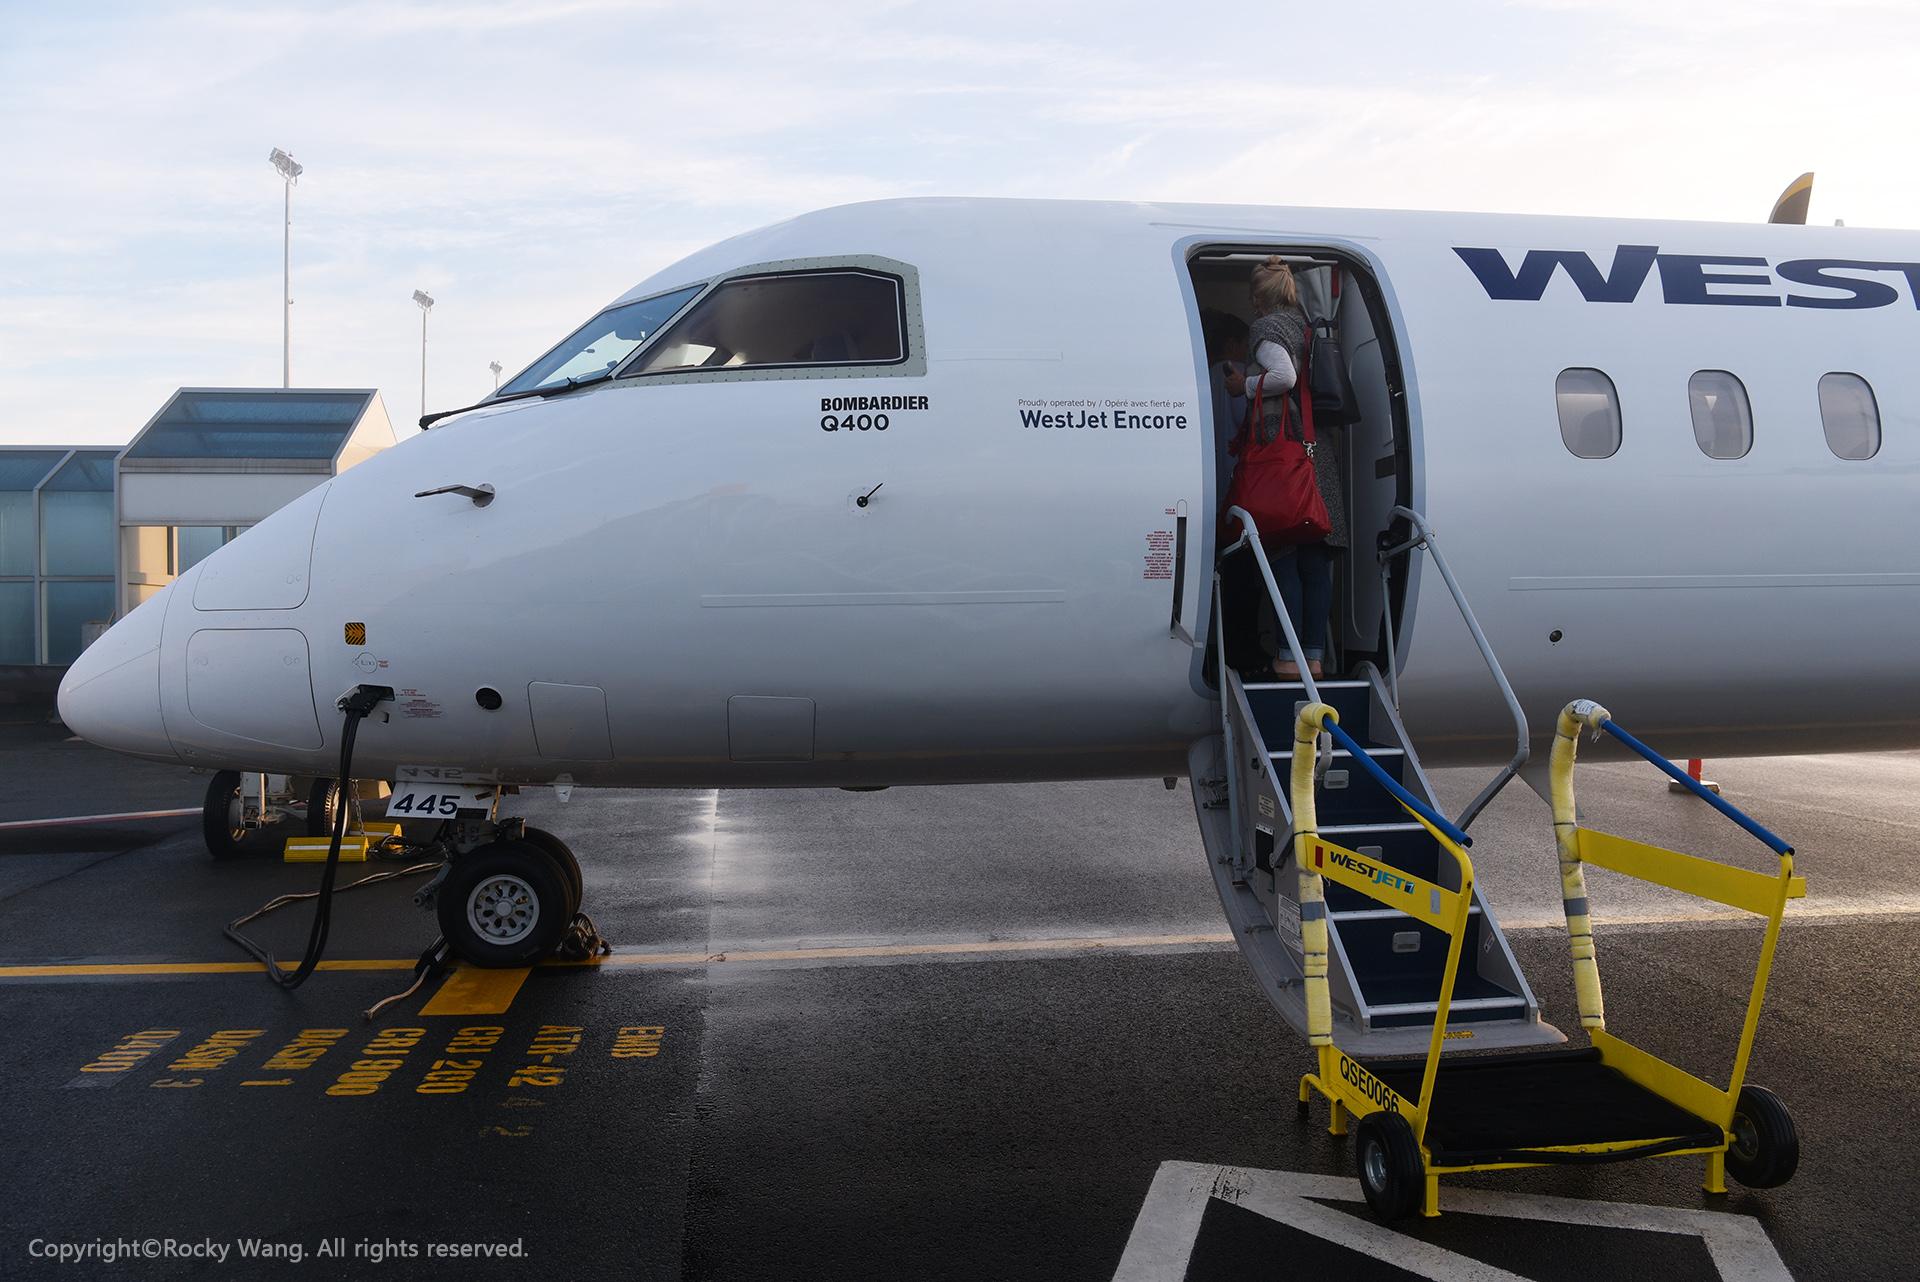 Re:[原创]简易版游记,纪念一次30段的环球飞行和一些碎碎念 BOMBARDIER DASH 8-Q402 C-GWEJ Halifax Int'l Airport